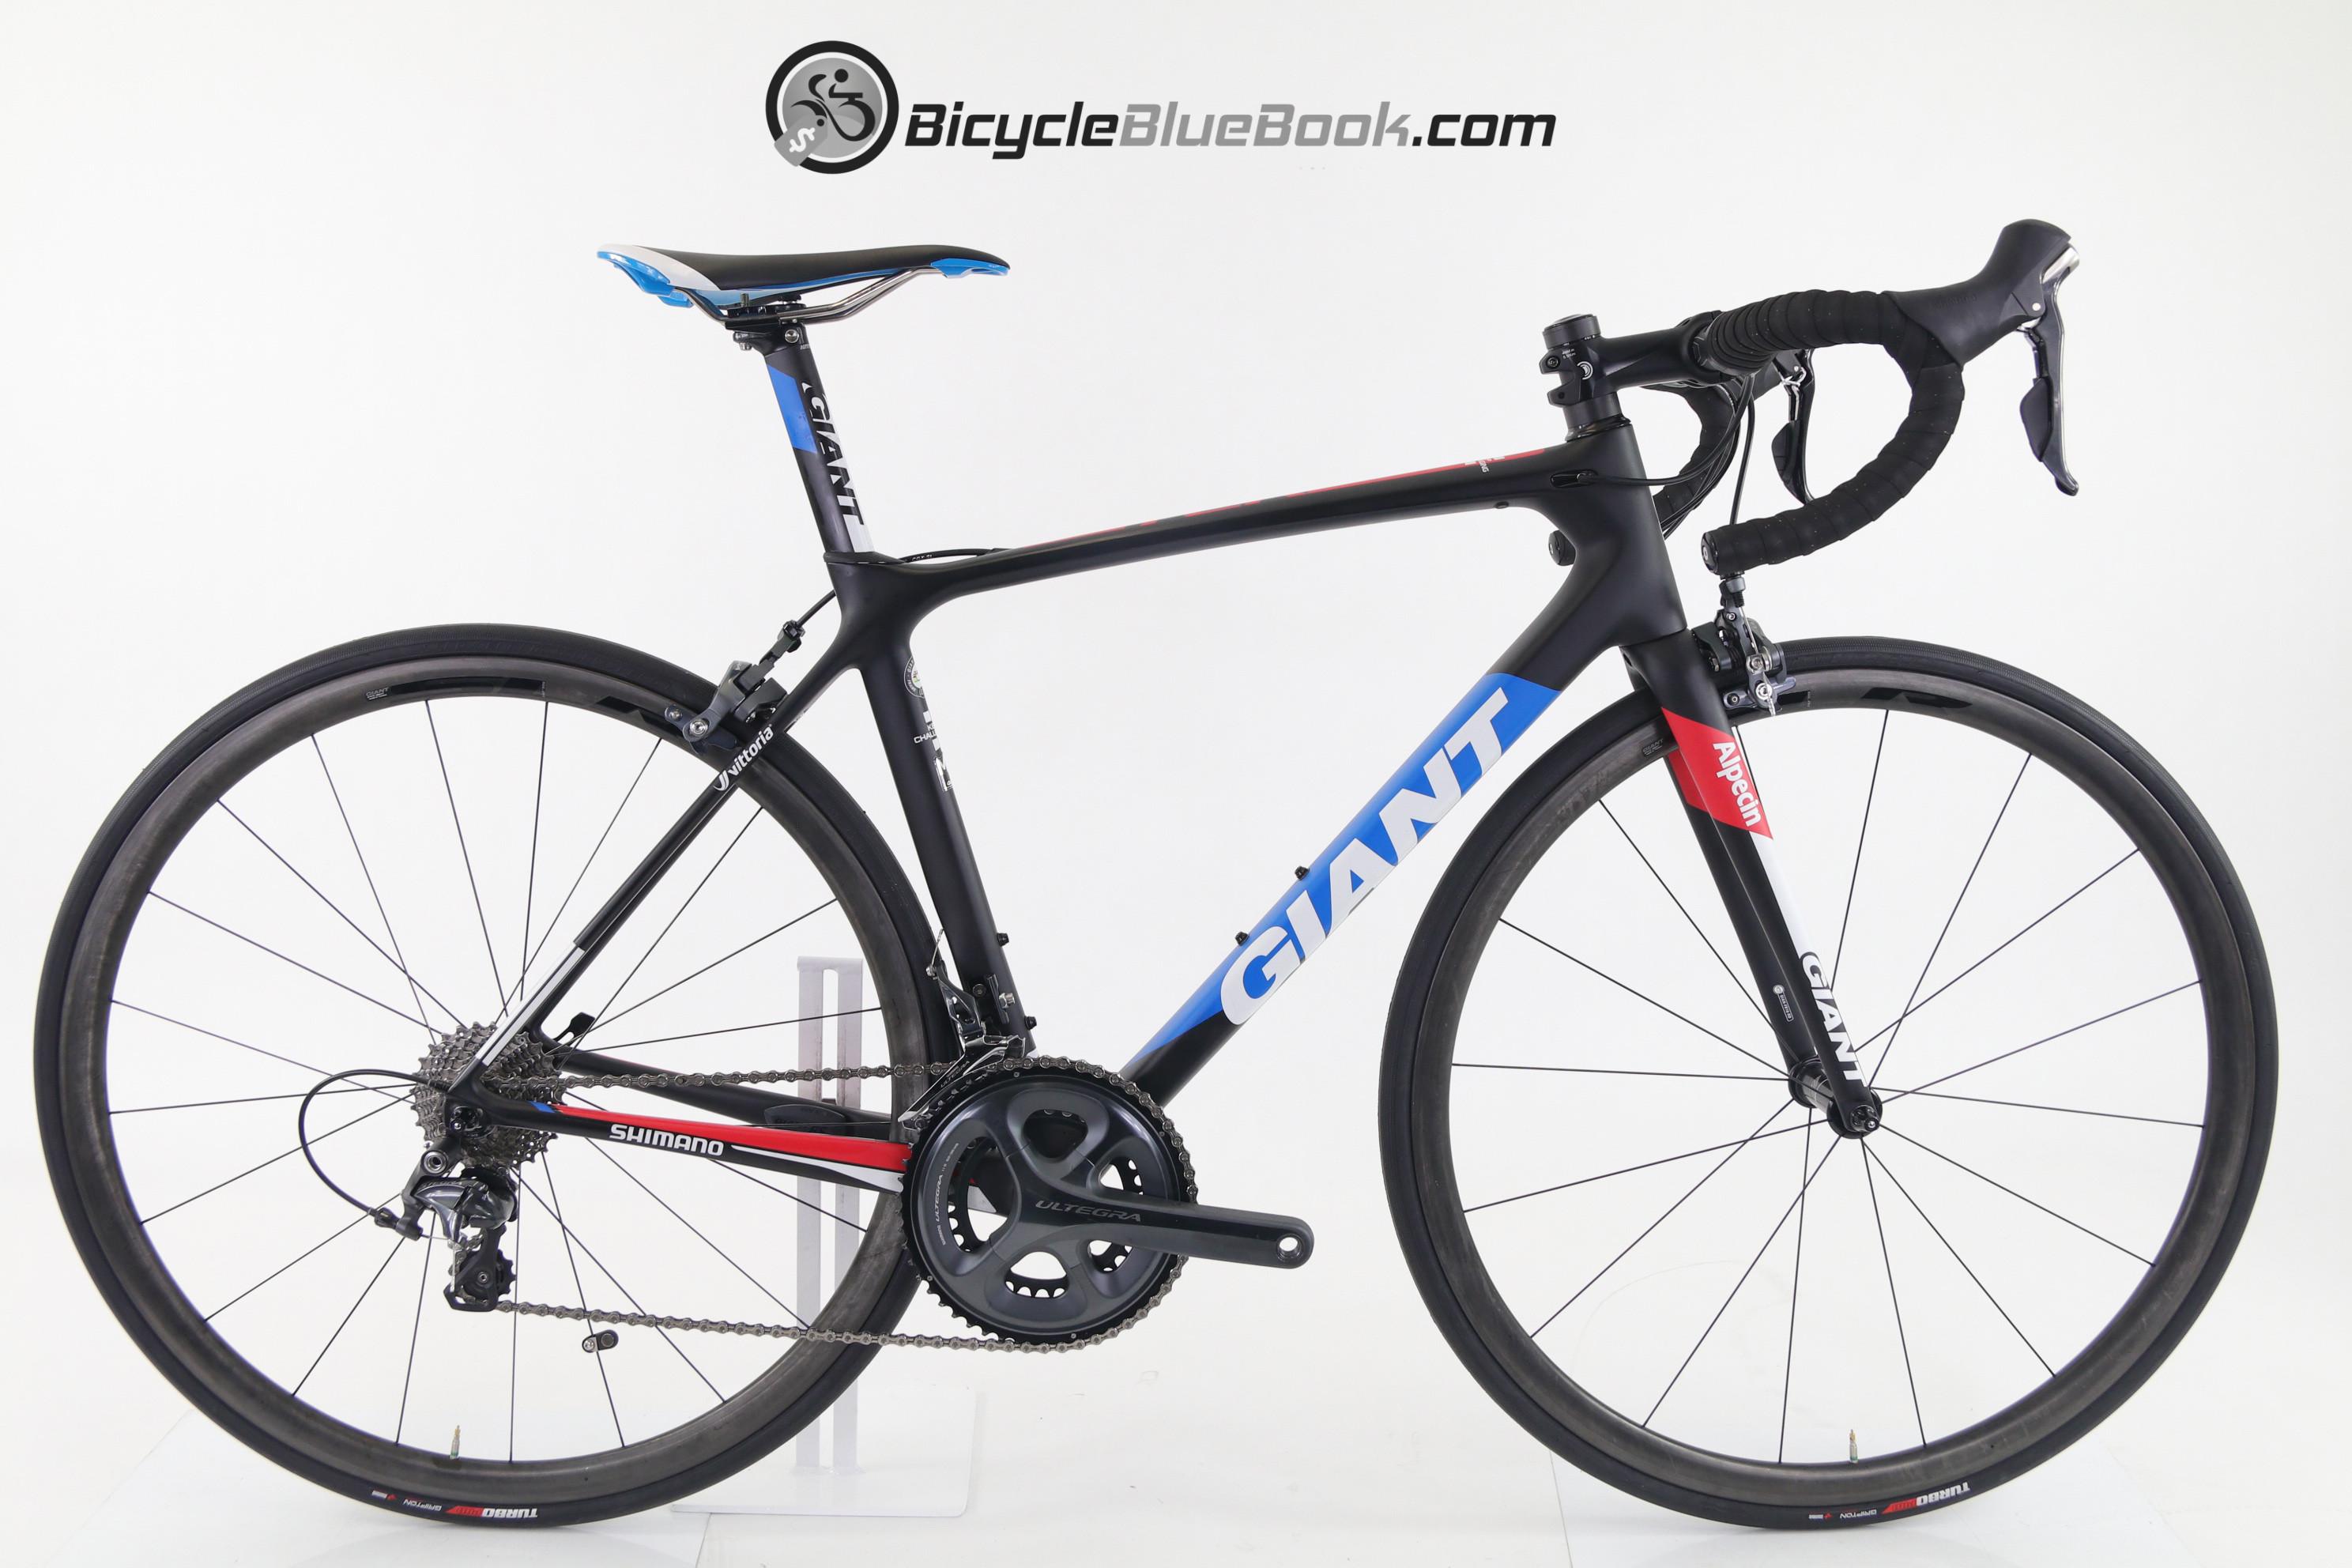 Giant Tcr Advanced Pro Team For Sale 2281 Slr 3 M 2014 Wht Blue Bike Details Marketplace